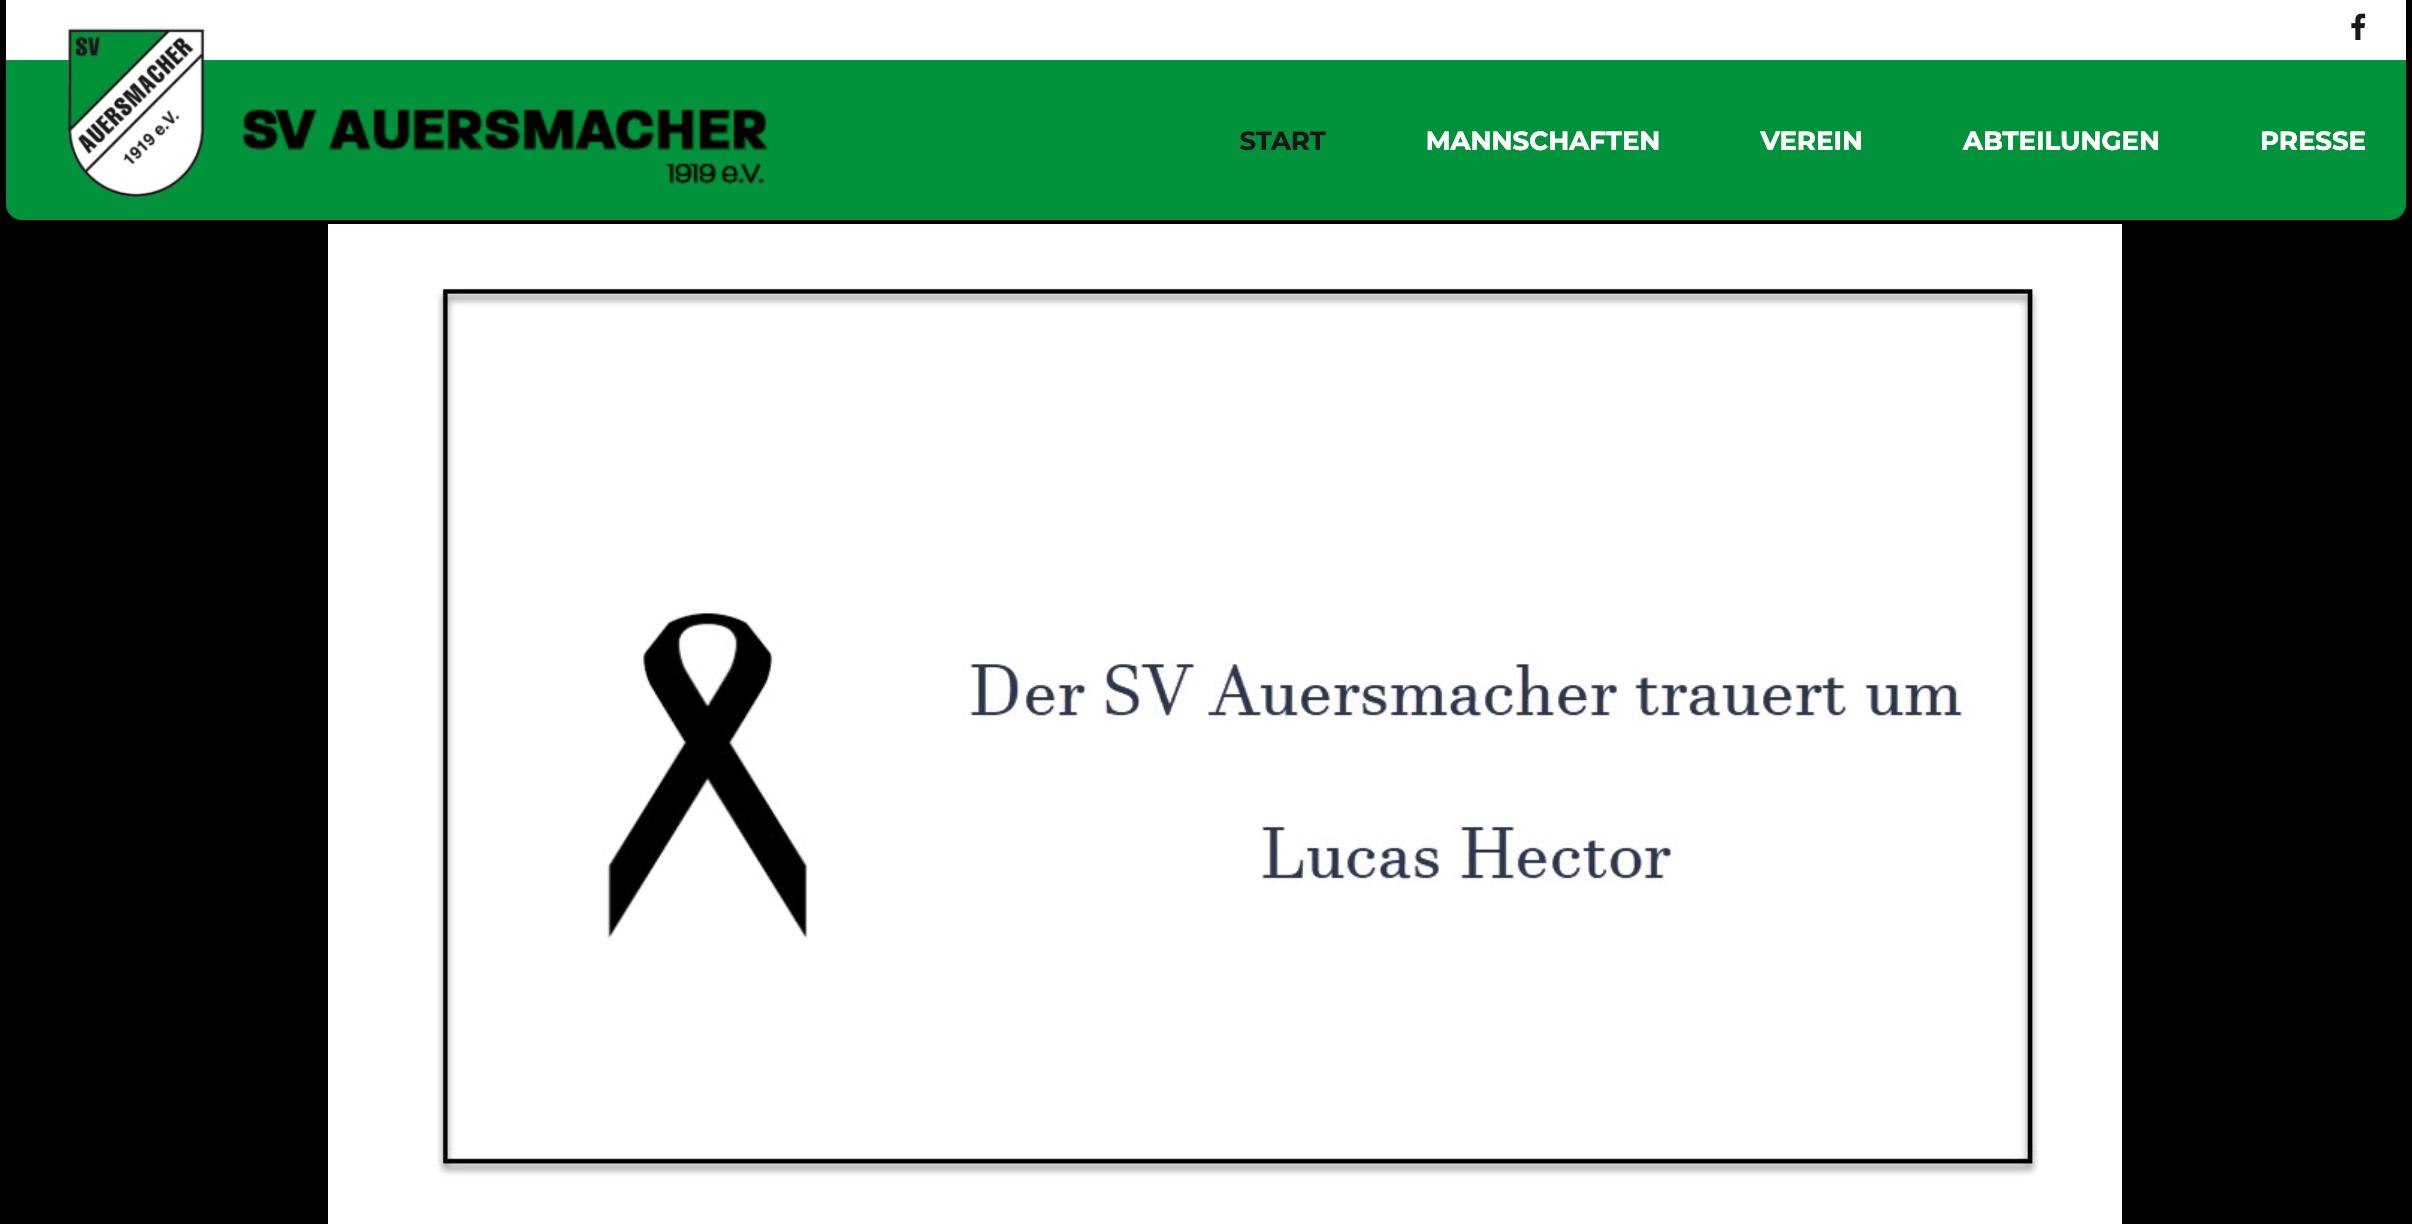 El Auersmacher confirmó la muerte de Lucas Hector